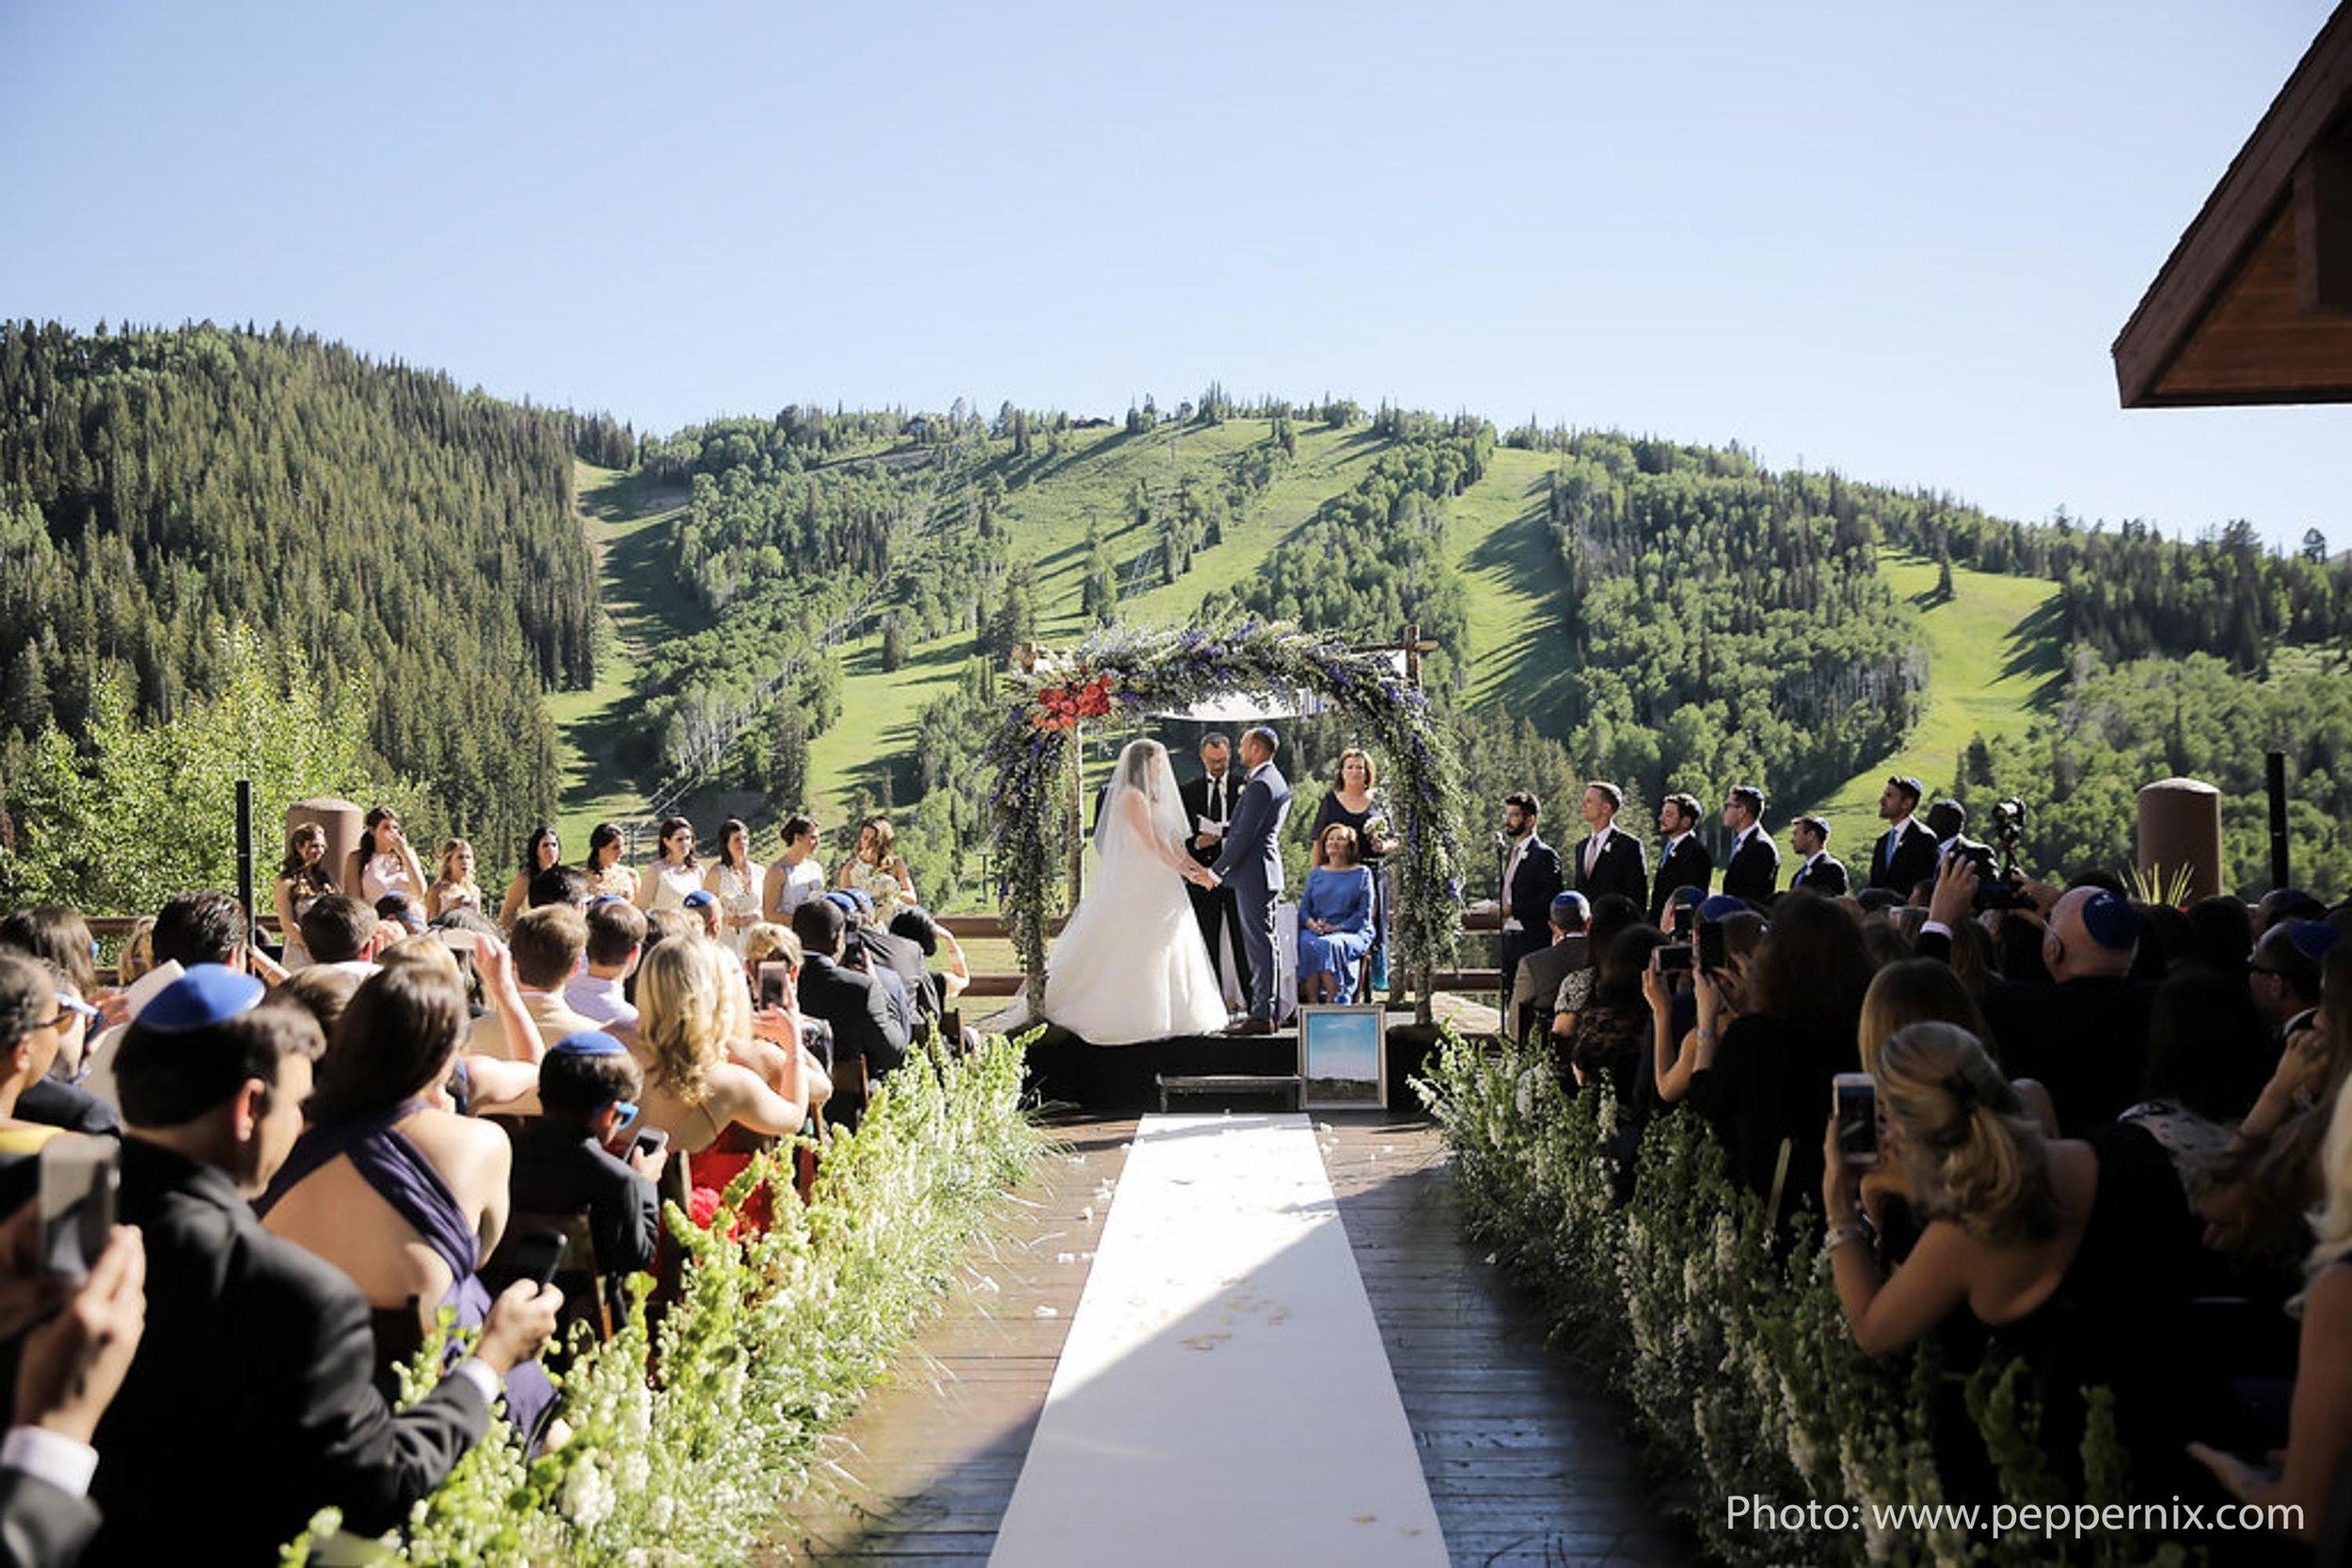 Summer Weddings Katz Park City PNP Eriksen Lodge-1879.jpg